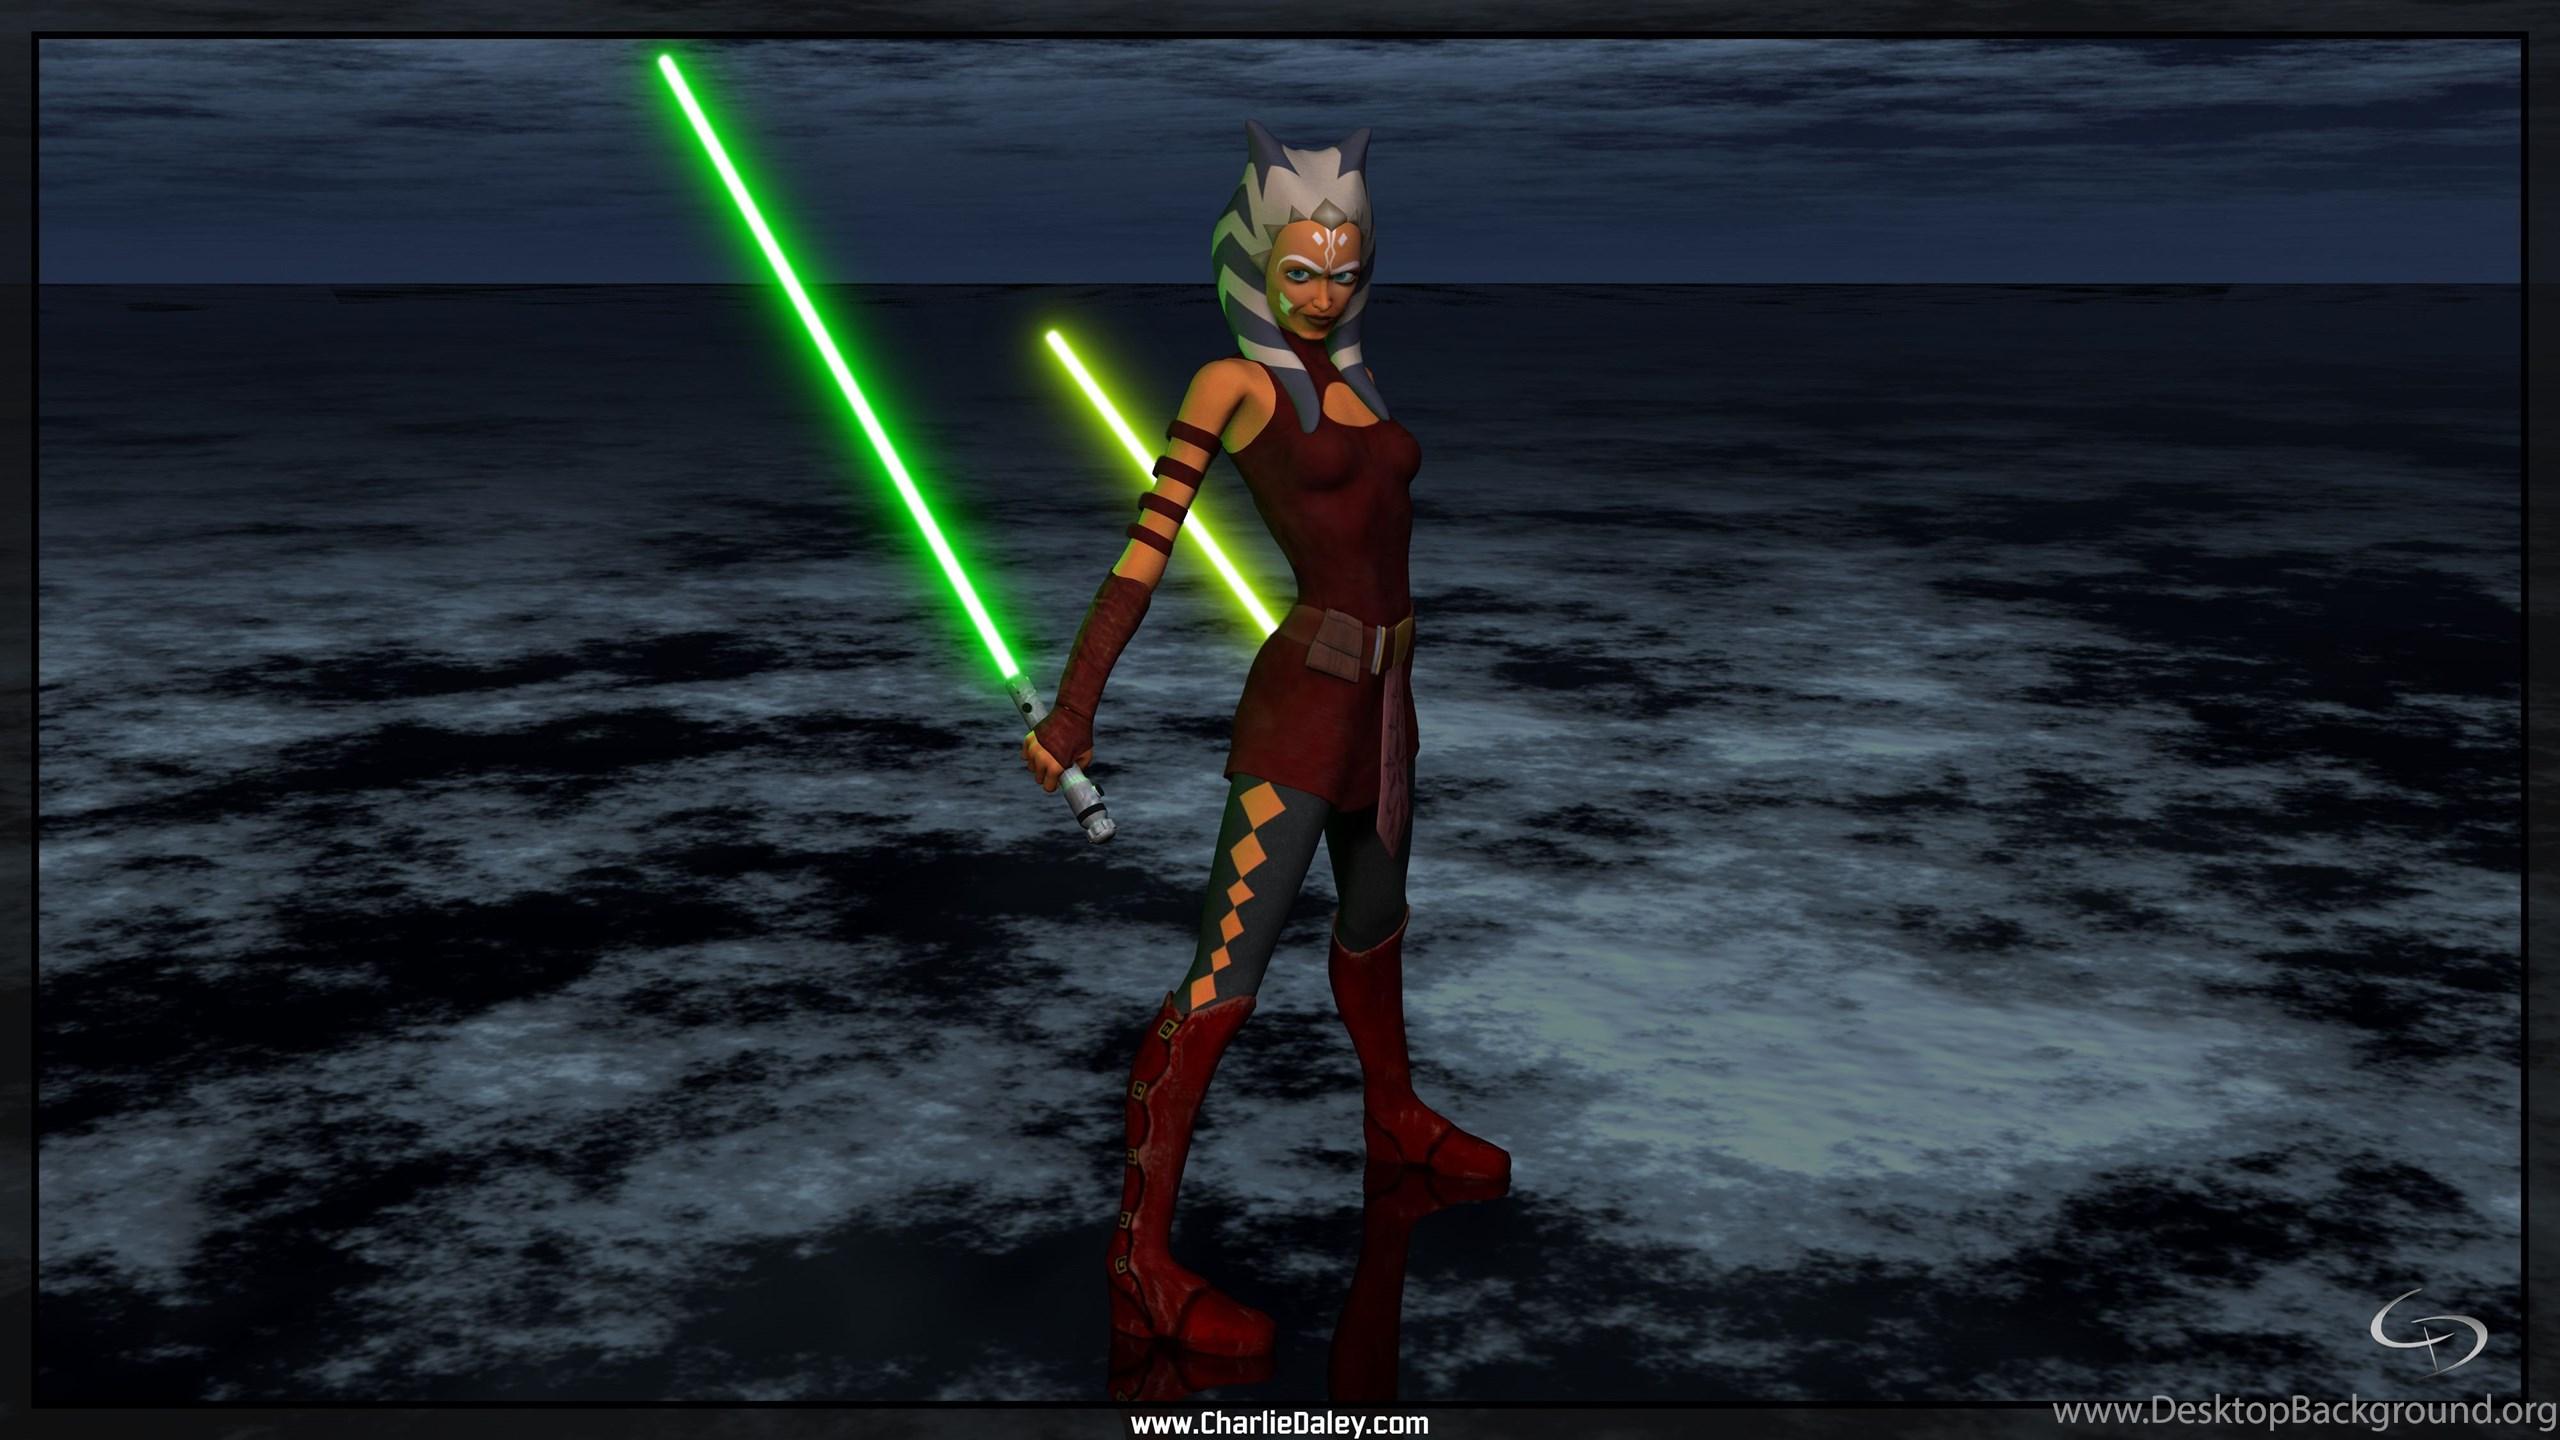 Clone Wars Ahsoka Tano By Crimsonight On DeviantArt